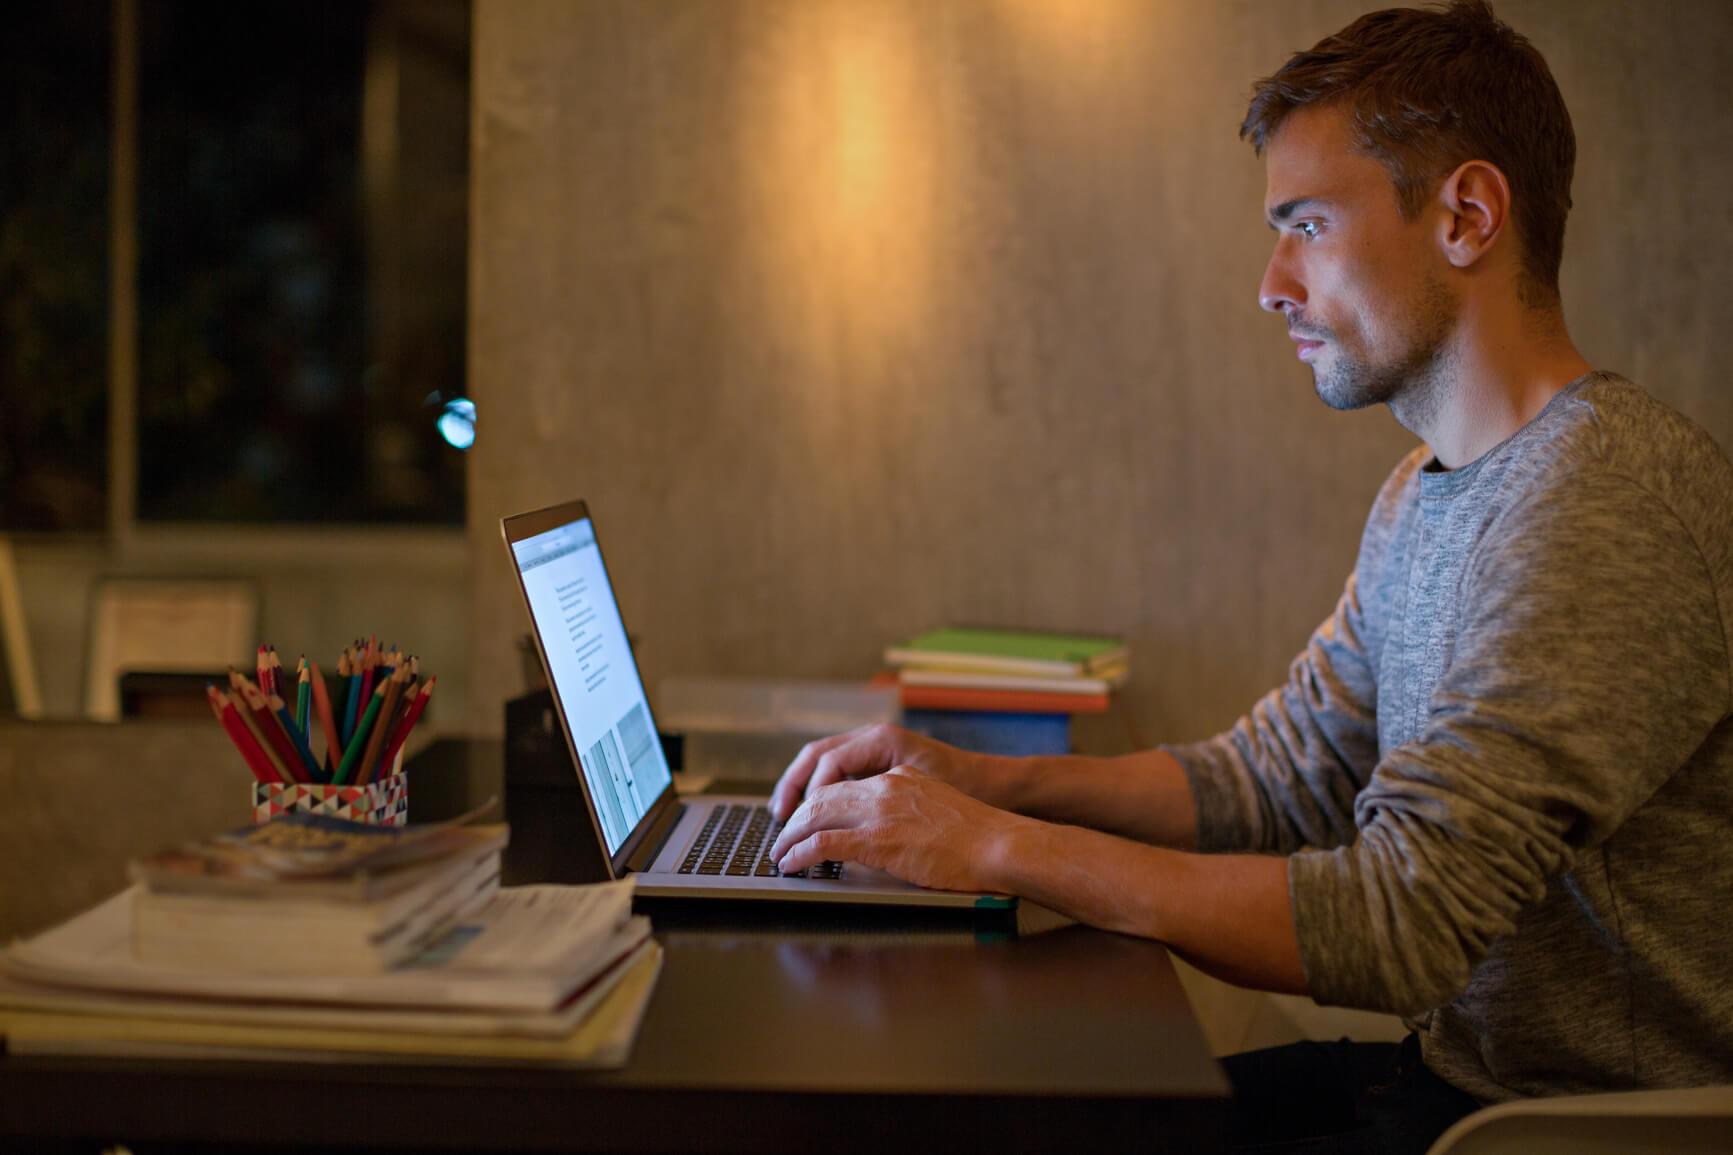 man-working-on-computer-gaslighting-at-work